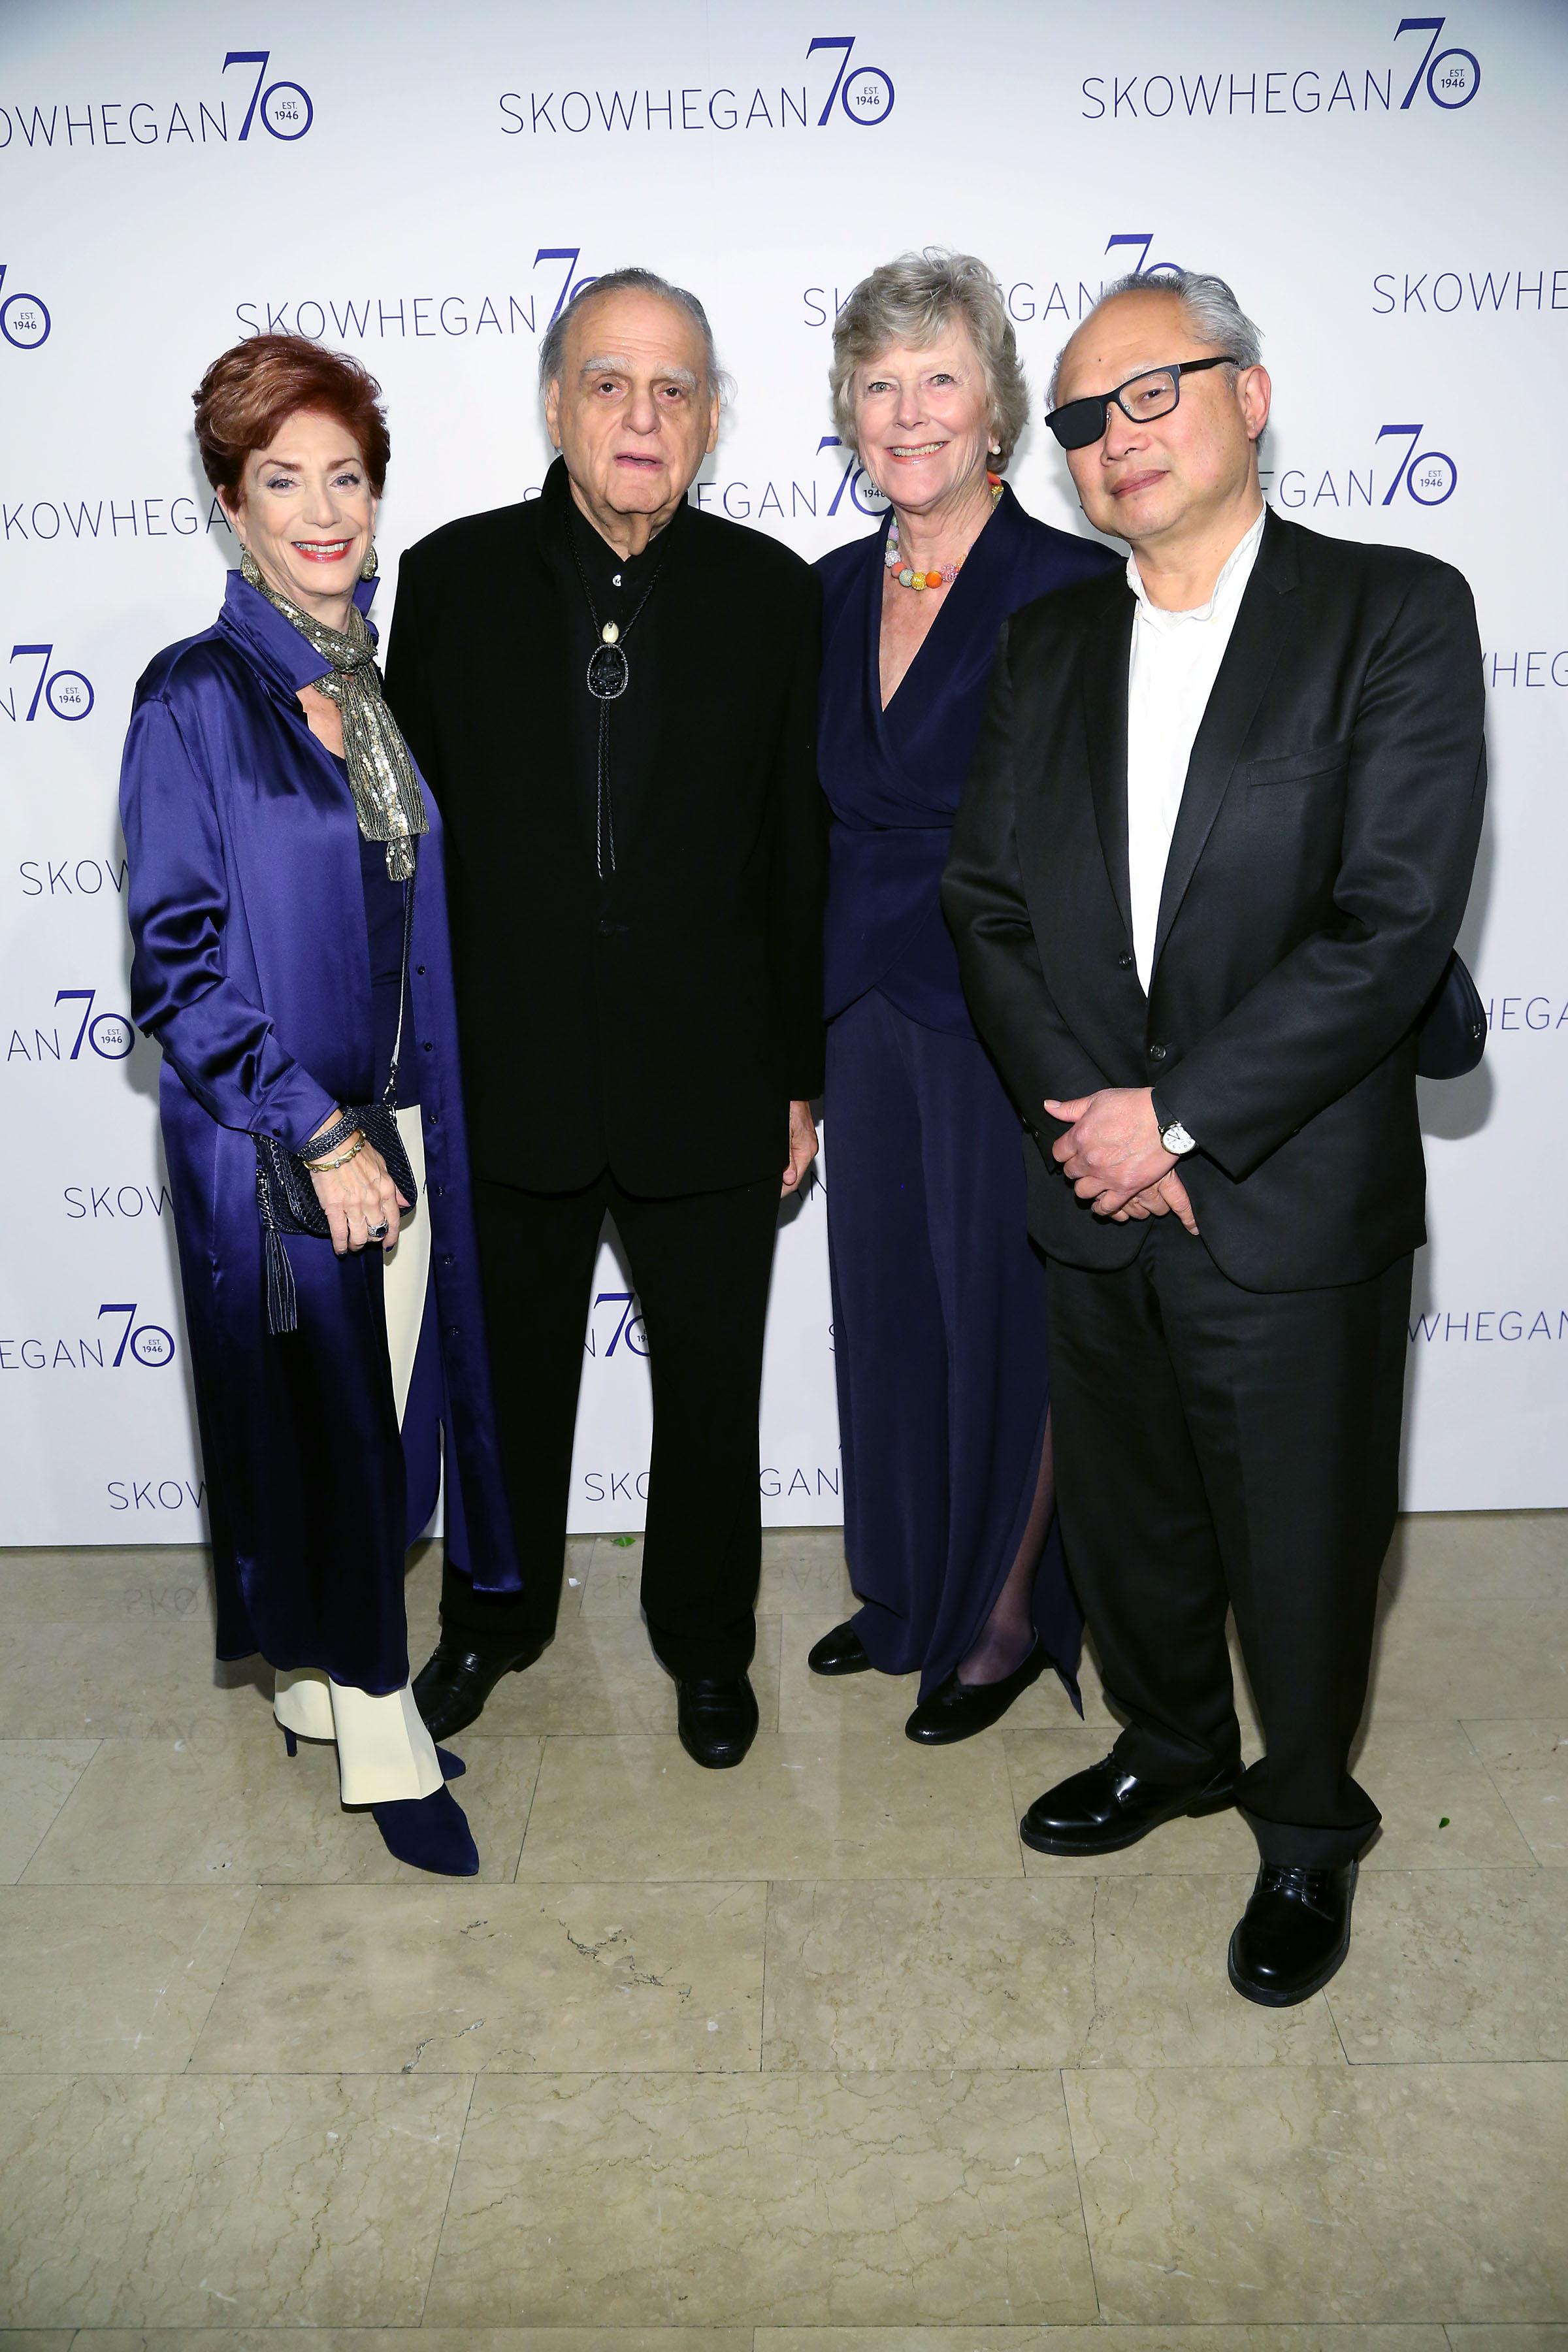 Shelley Rubin, Donald Rubin, Ann Gund, Mel Chin==Skowhegan 70th Anniversary Celebration & 2016 Awards Dinner==The Plaza, NYC==April 26, 2016==©Patrick McMullan==Photo: Sylvain Gaboury/PMC====